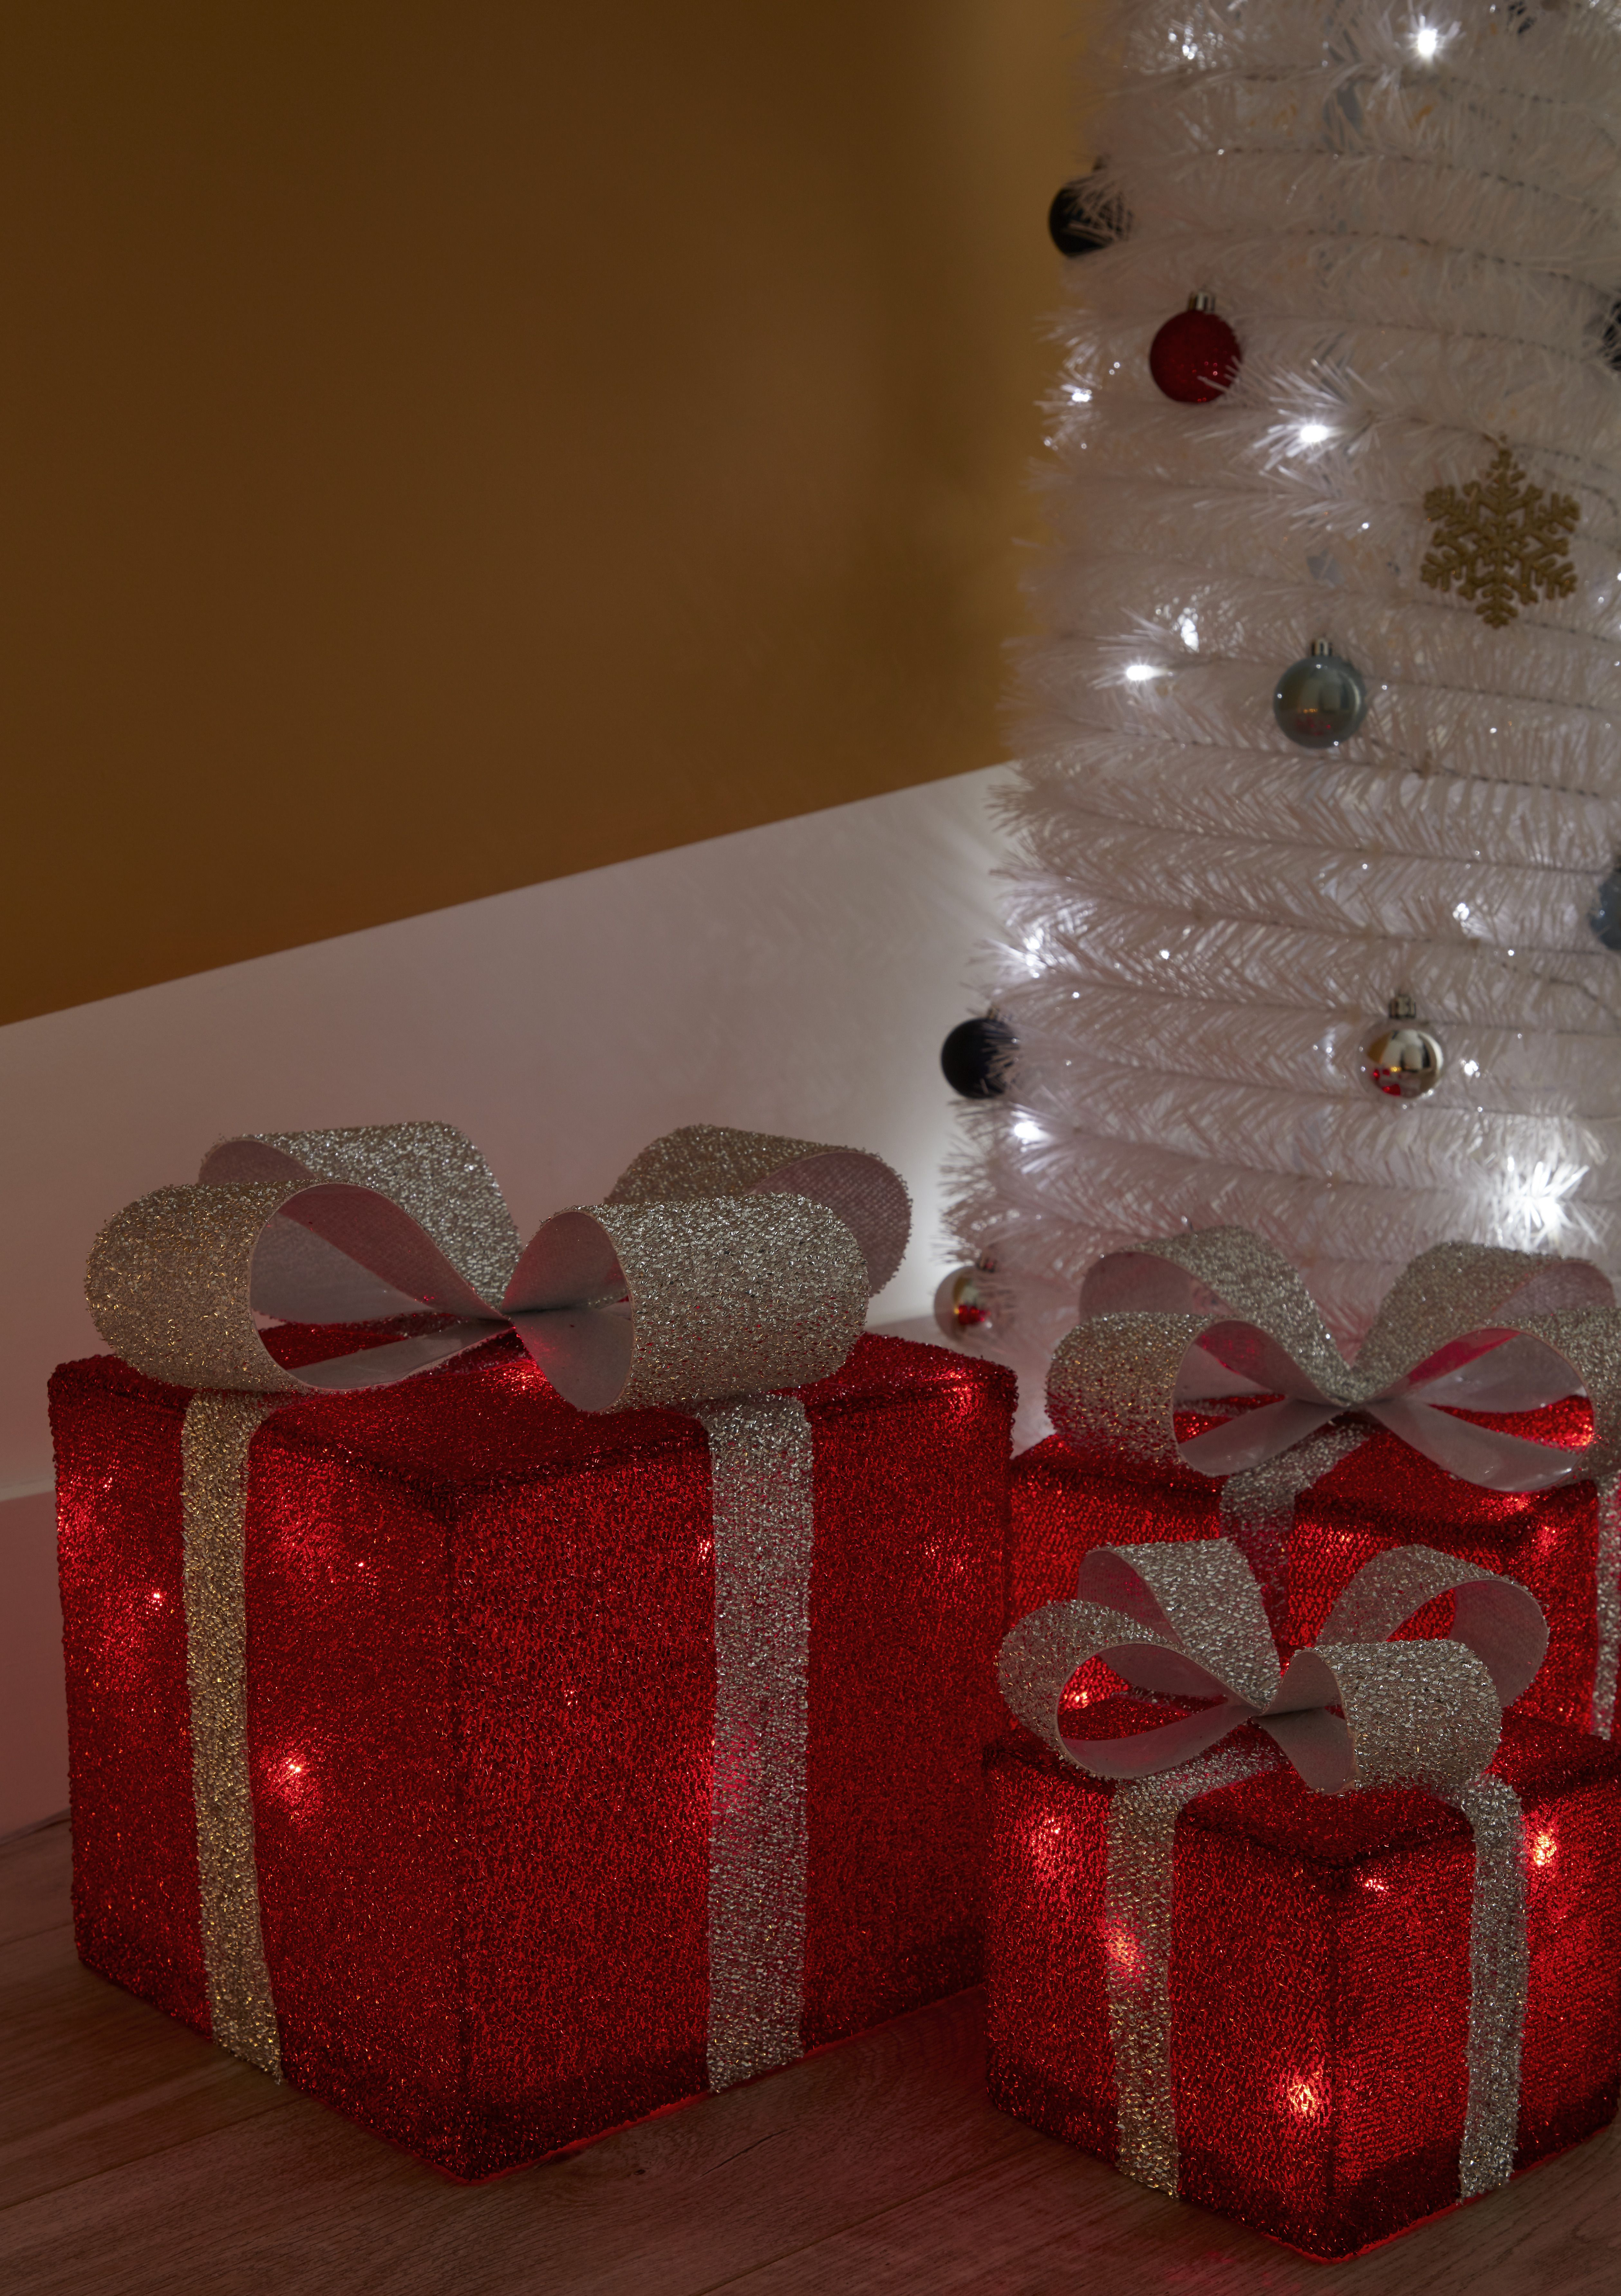 Prezenty Led Zewnetrzne 3d 3 Szt Gifts Gift Wrapping Led